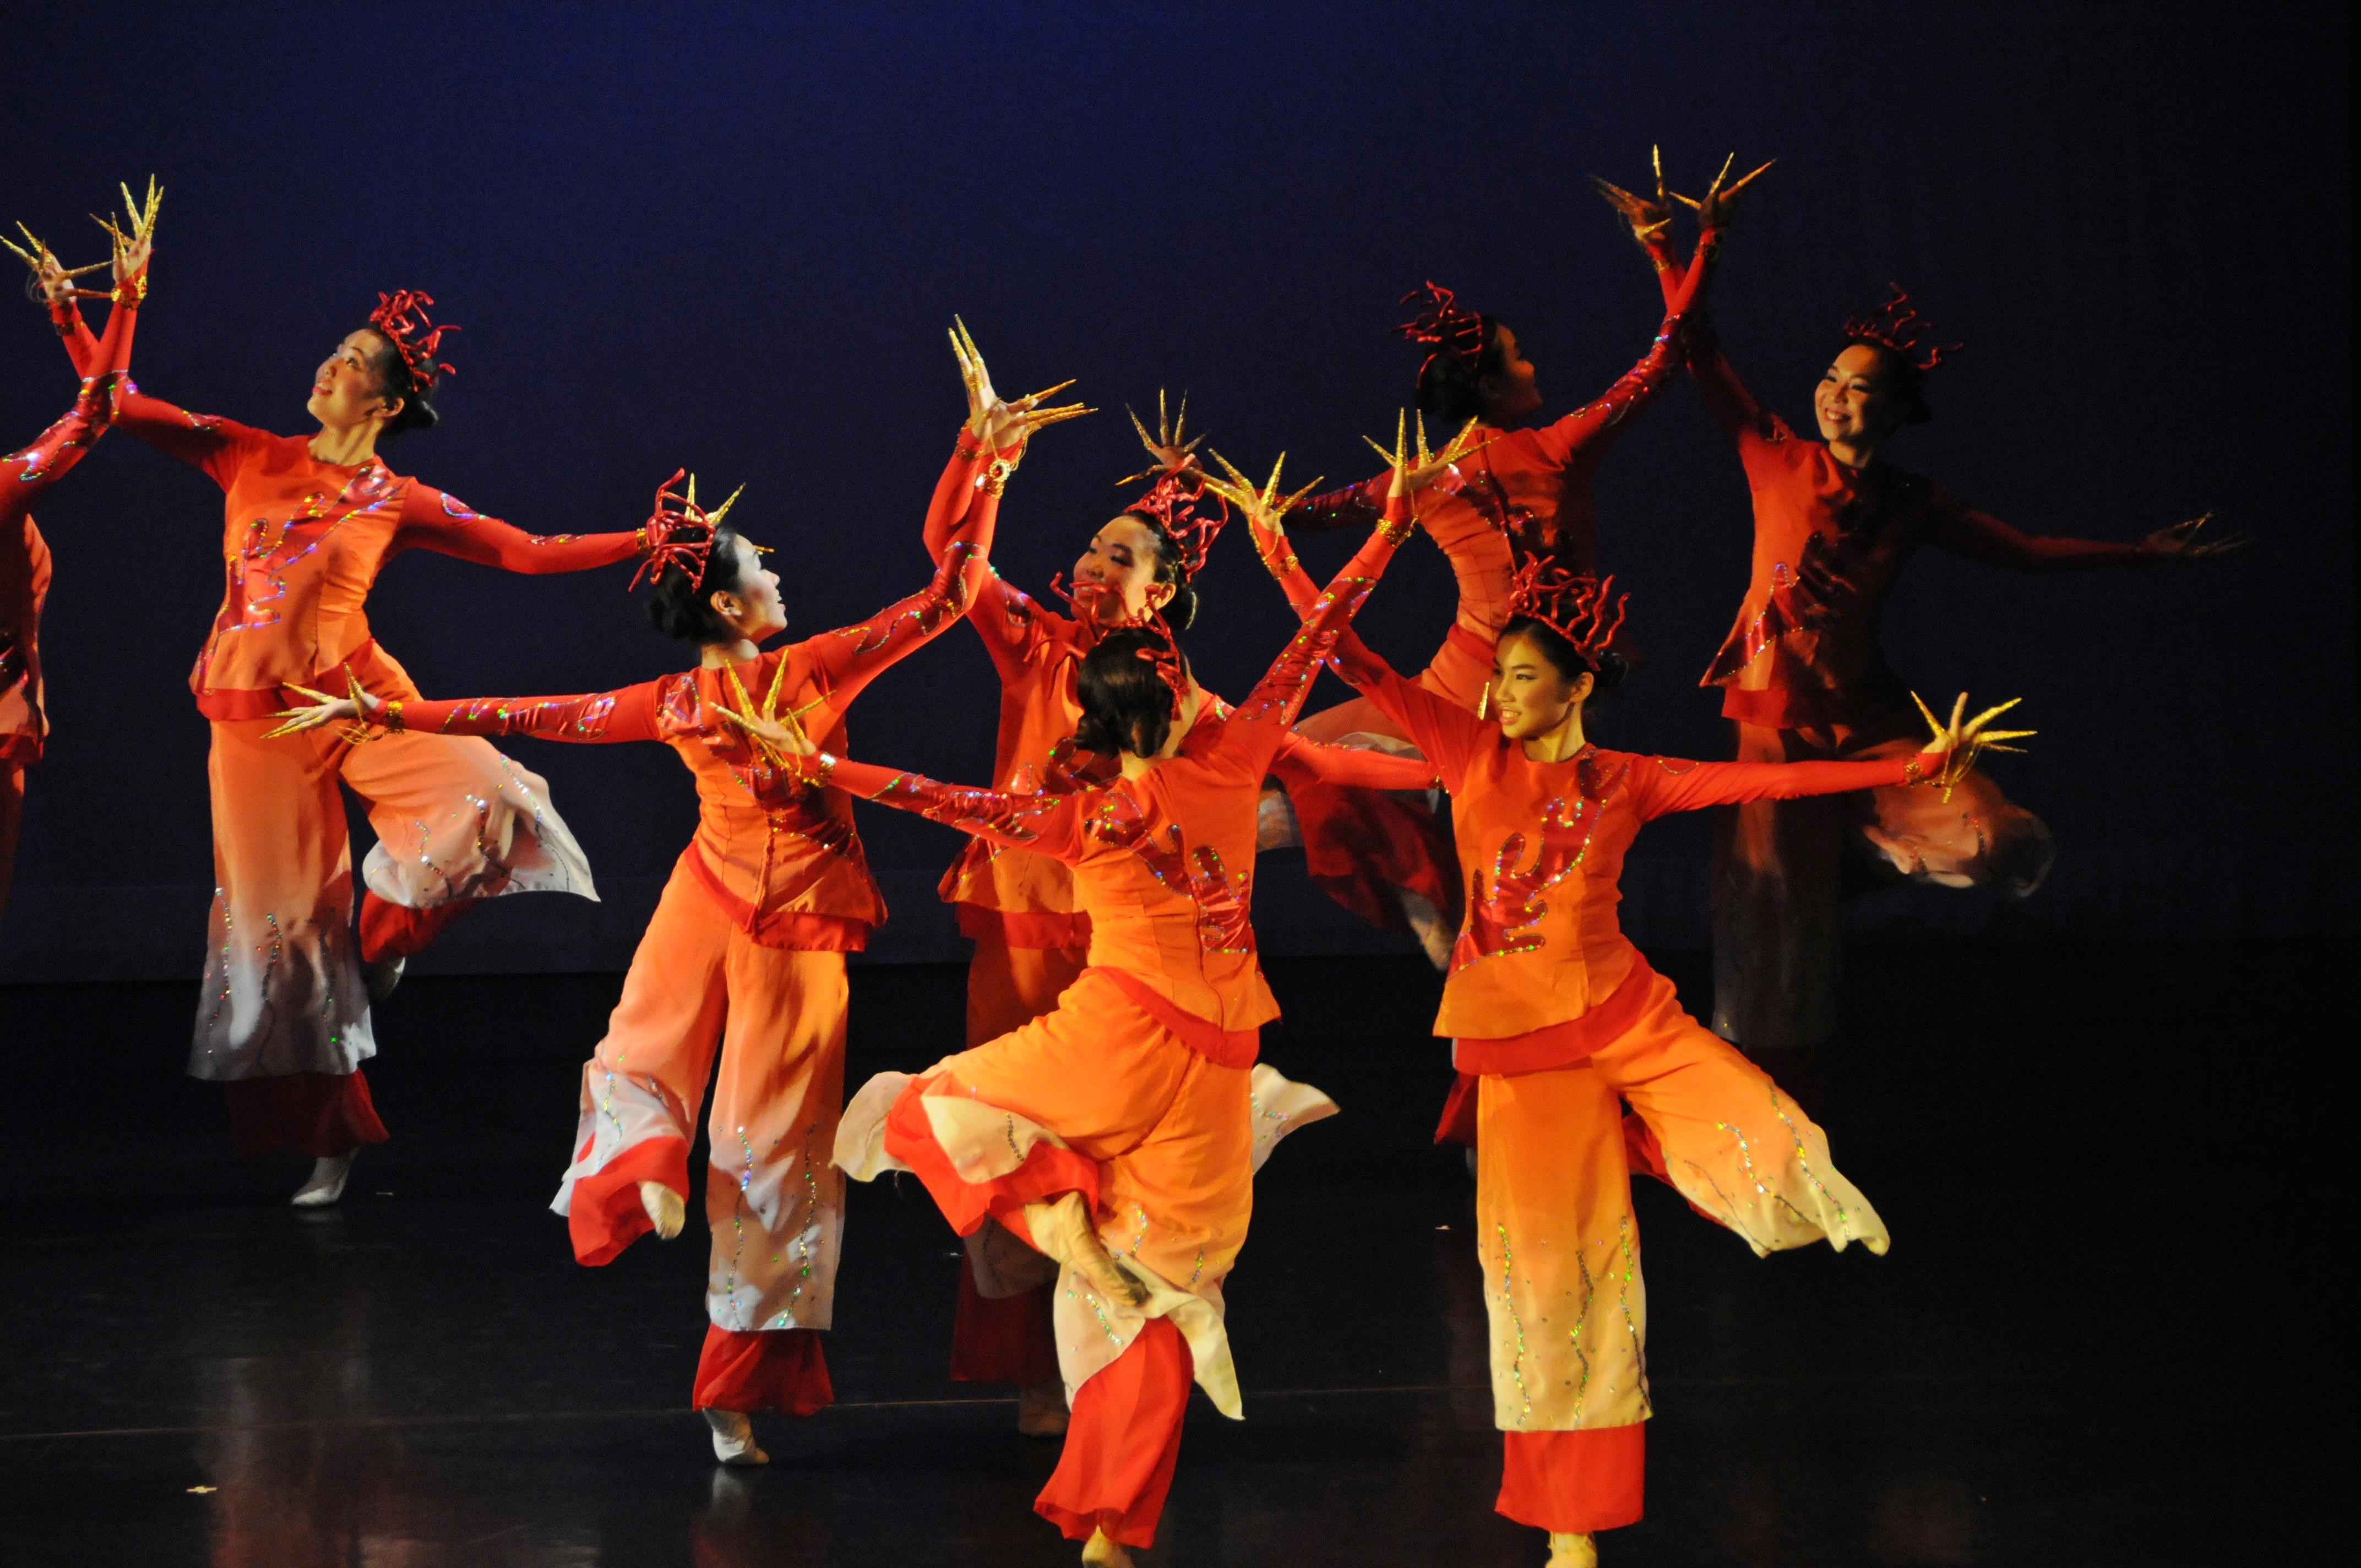 https://www.hkcchoir.org/sites/default/files/youth_dance_2016wu_yuan_chuan_cheng_4.jpg